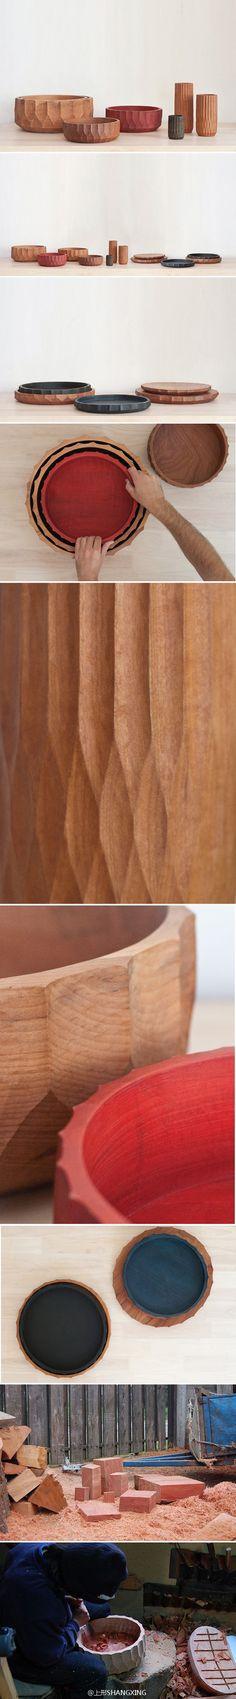 「Las Doce手工木刻碗碟」 来自智利的The Andes House工作室 | http://www.douban.com/photos/album/106224691/